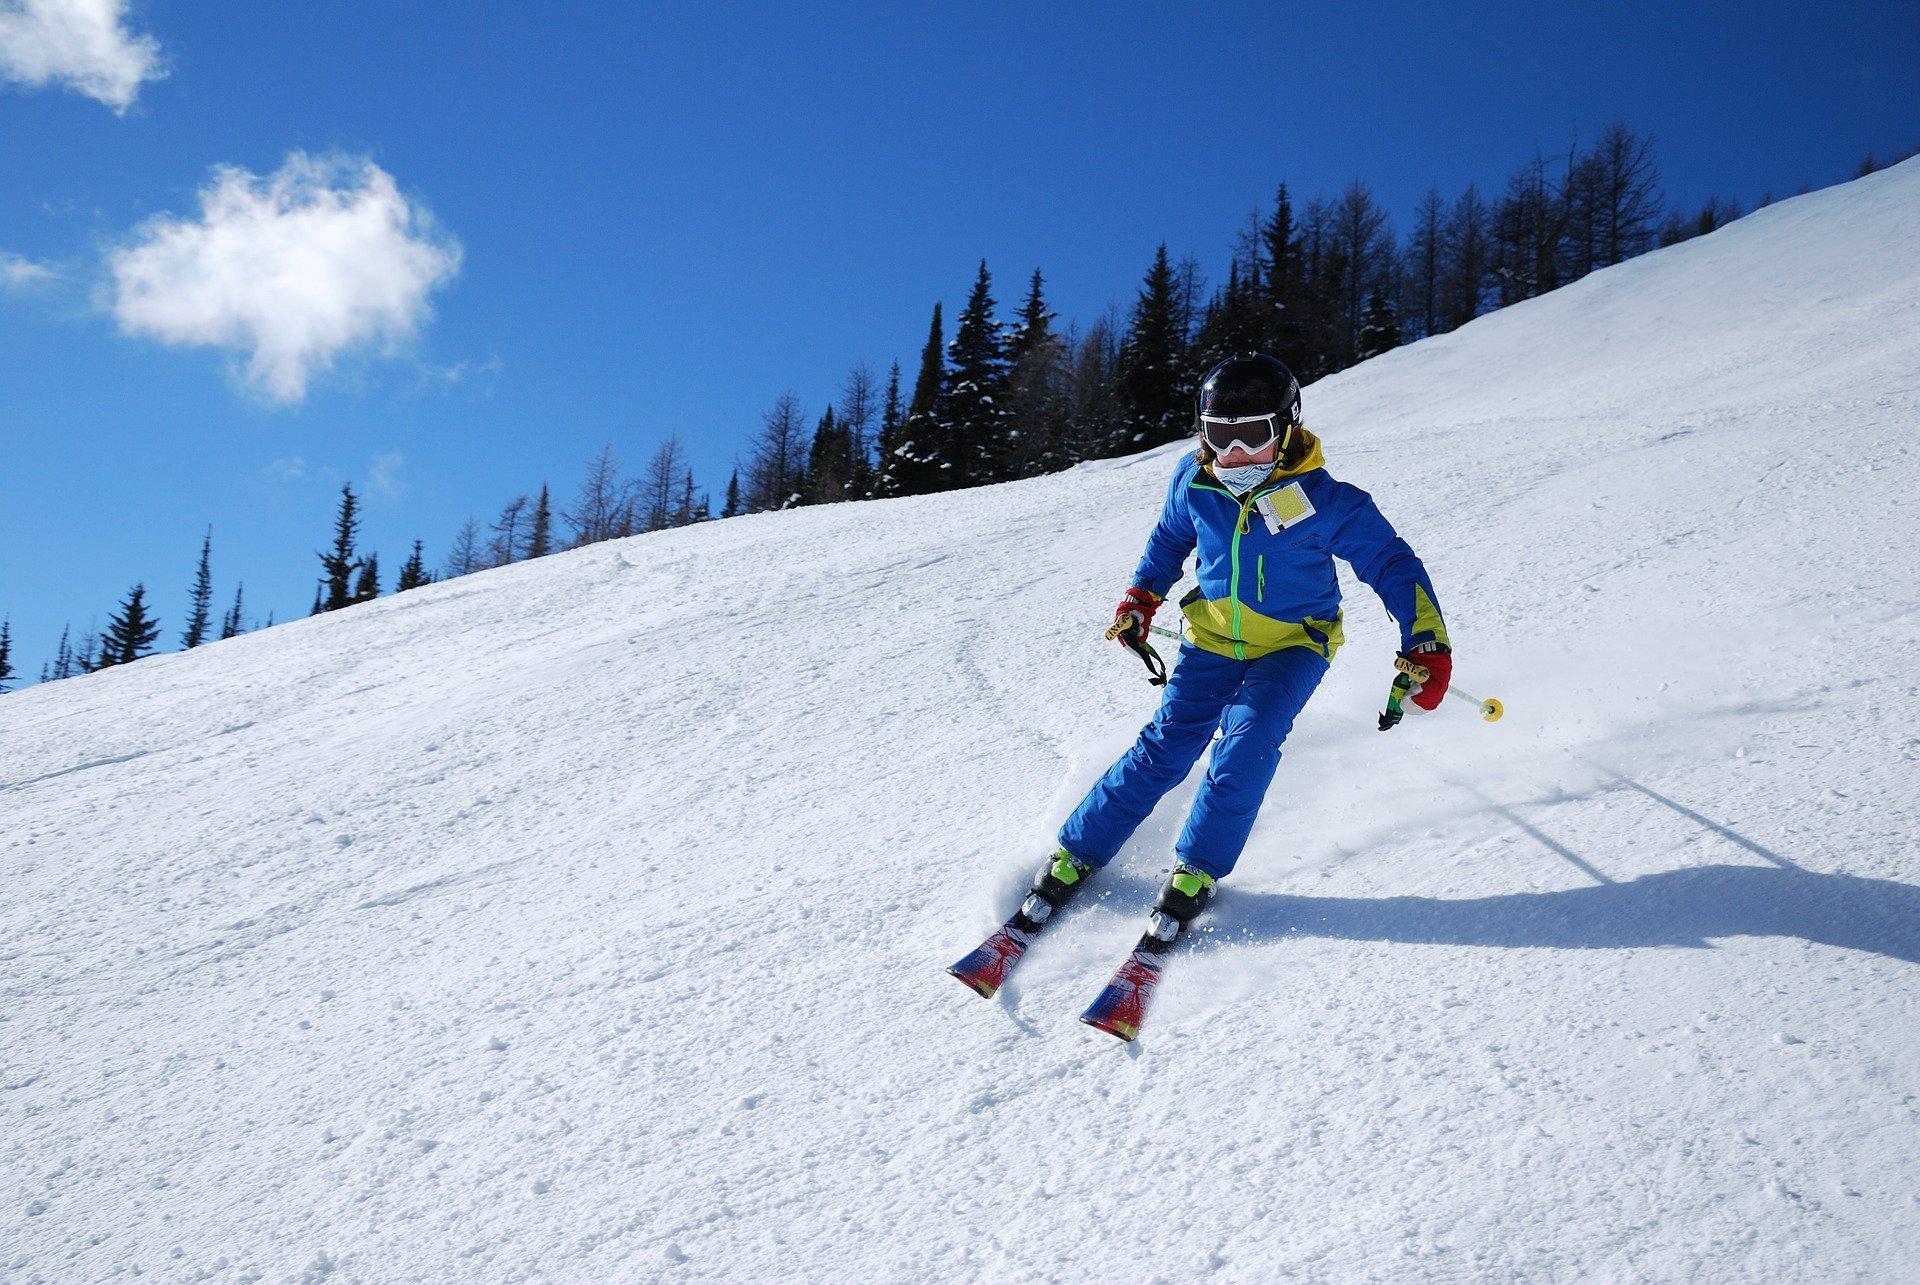 15 Best Places to Go Snowboarding & Skiing Near Washington, DC